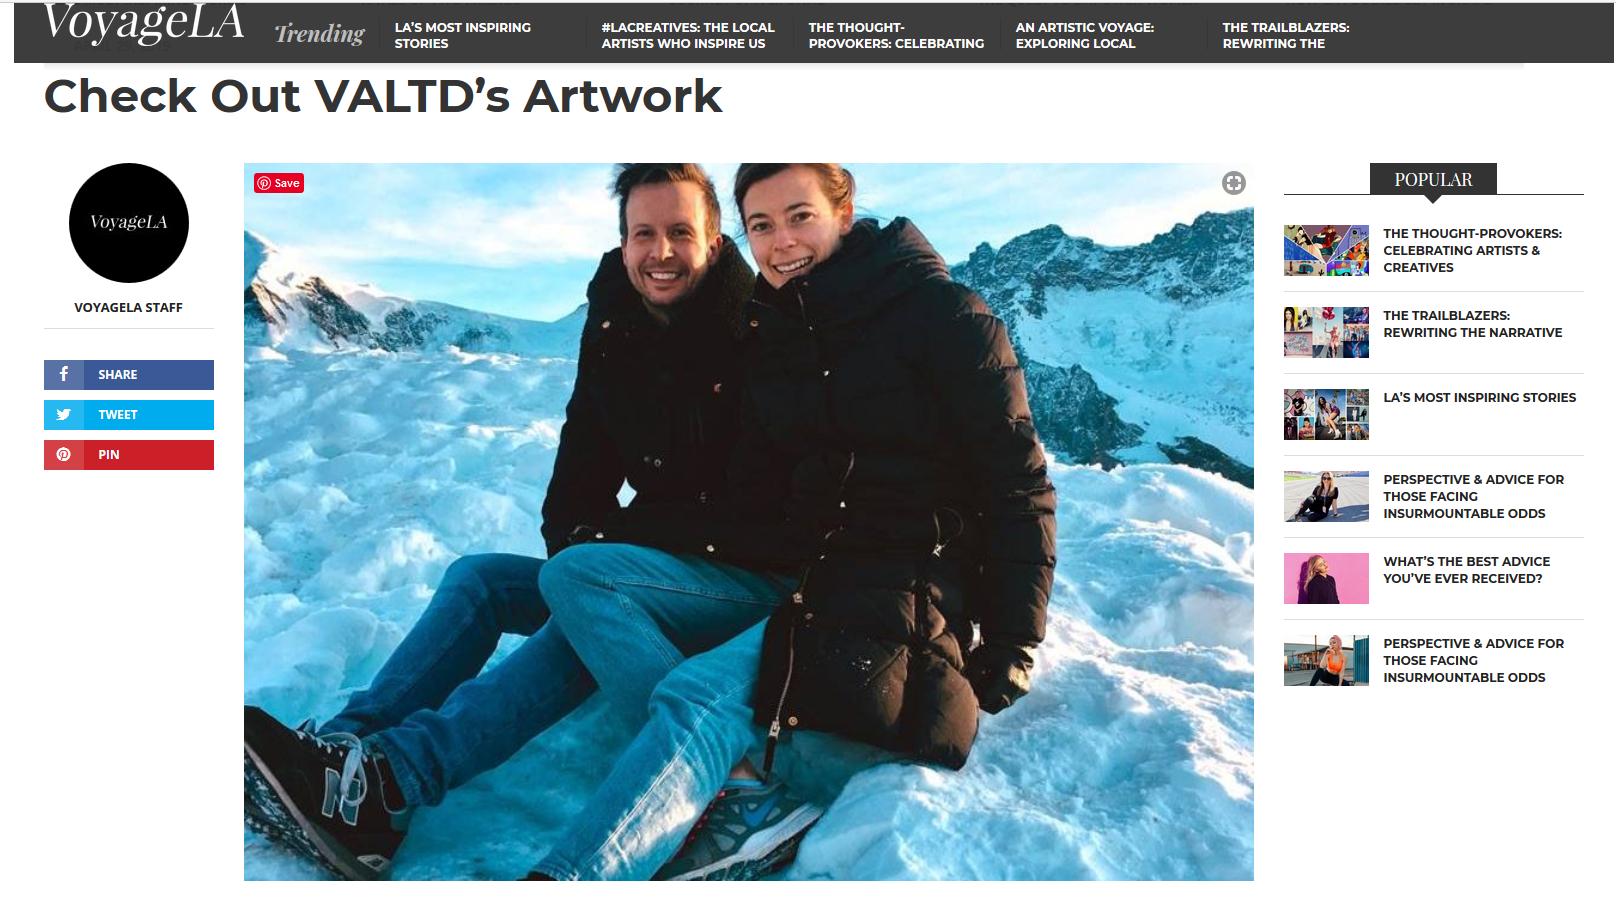 Clip from VoyageLA.com 's article 2019. Picture: Gornergratt, Switzerland.